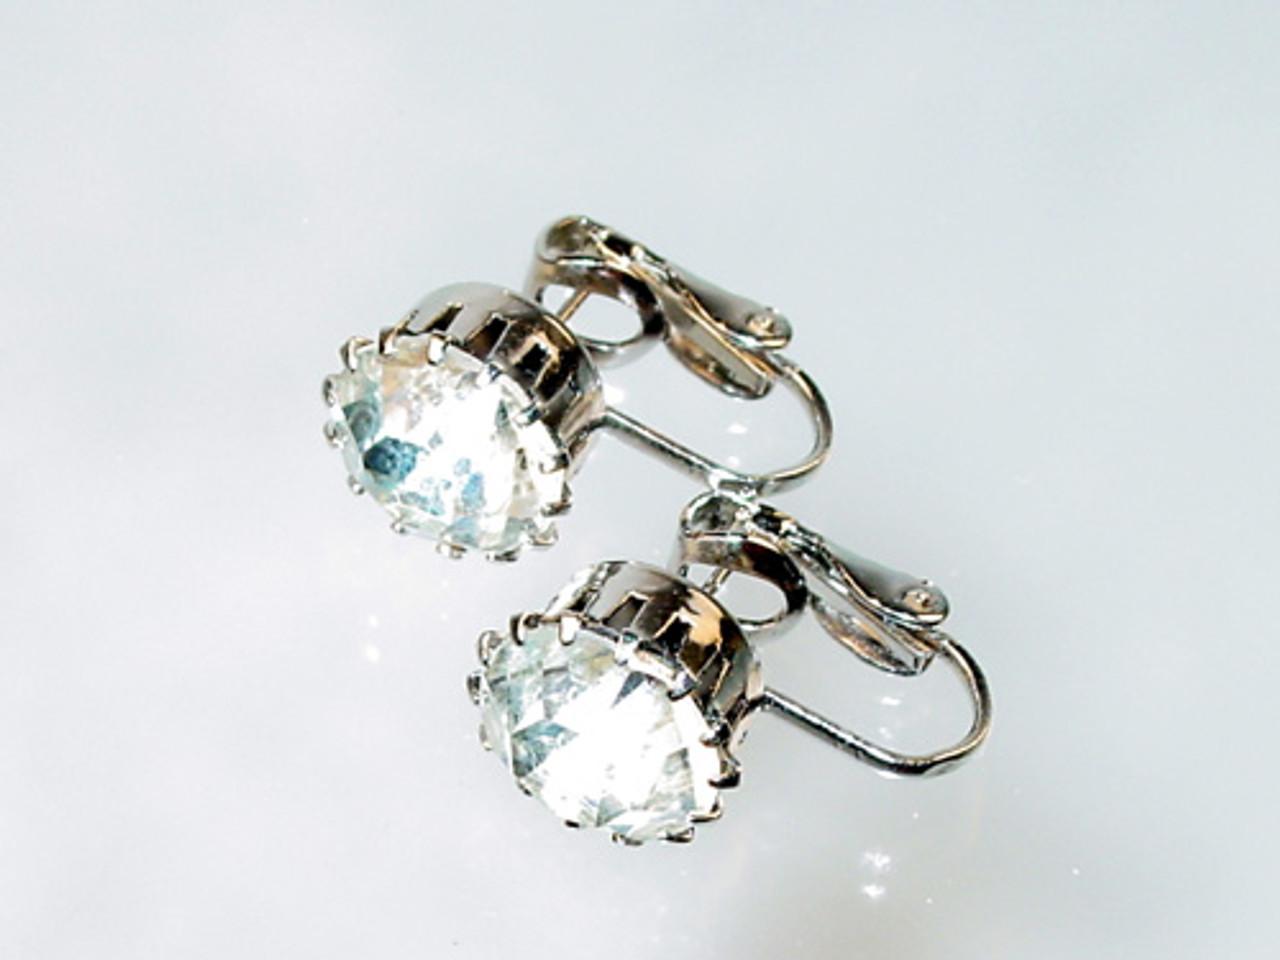 Vintage large rhinestone center earrings